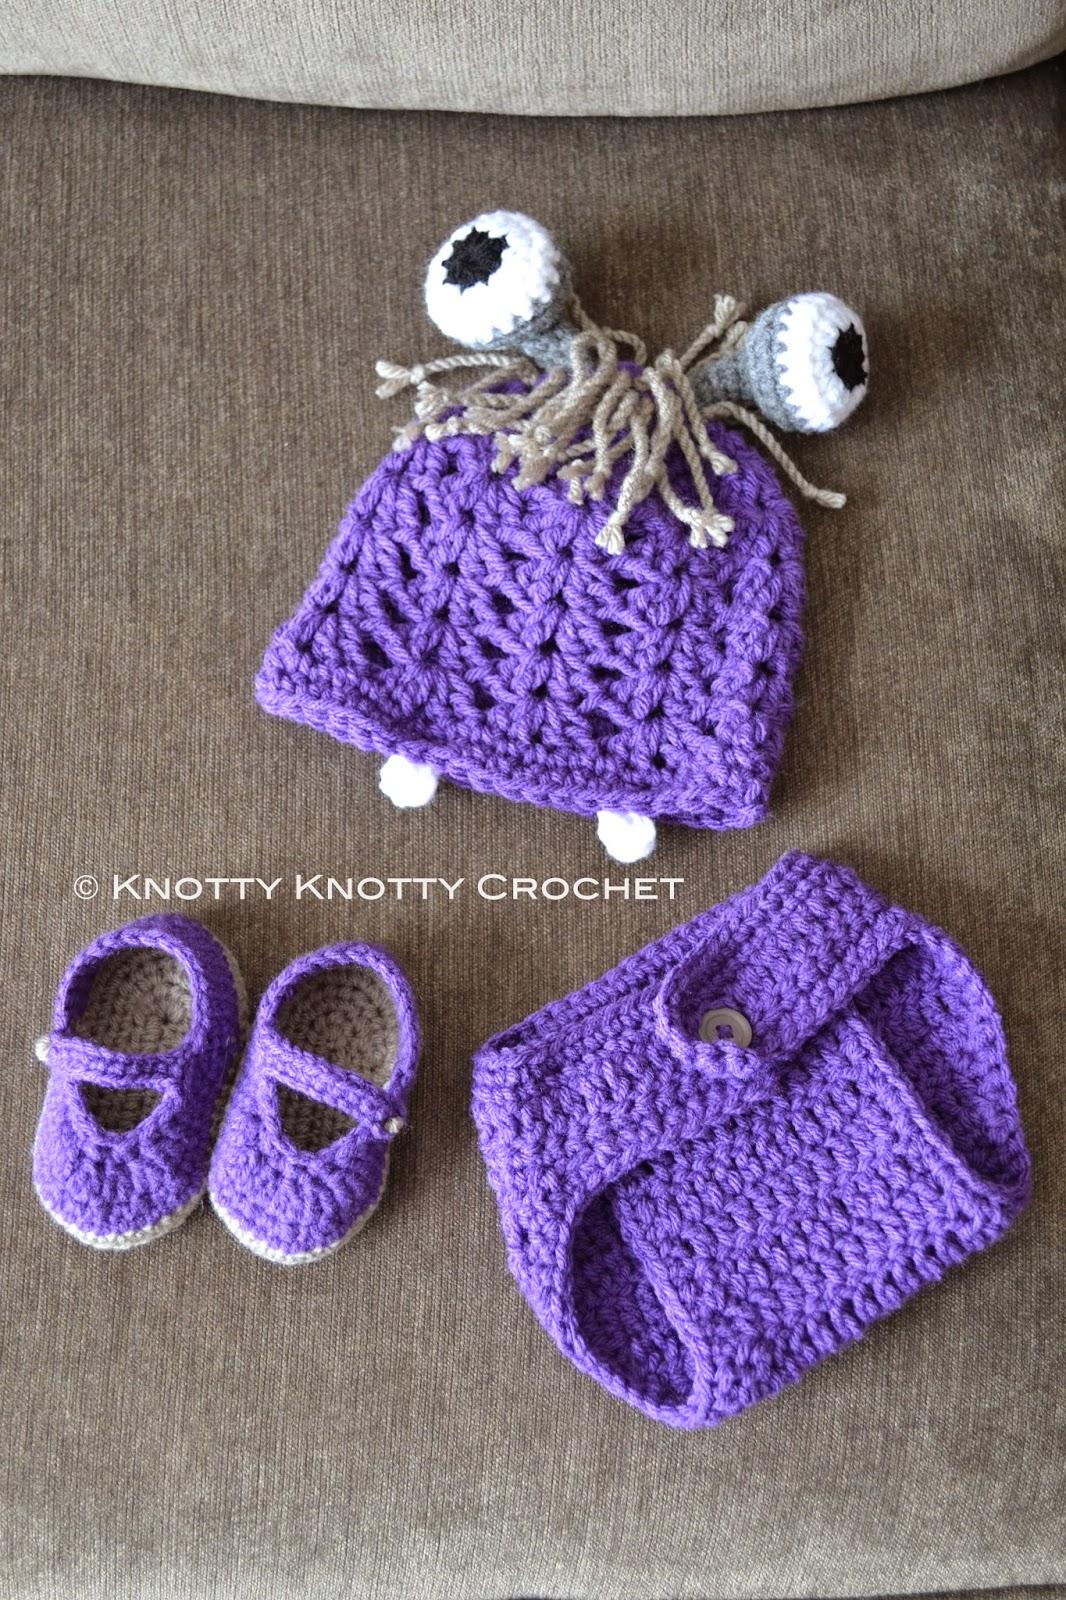 Knotty Knotty Crochet Boo Inspired Three Piece Set Free Pattern